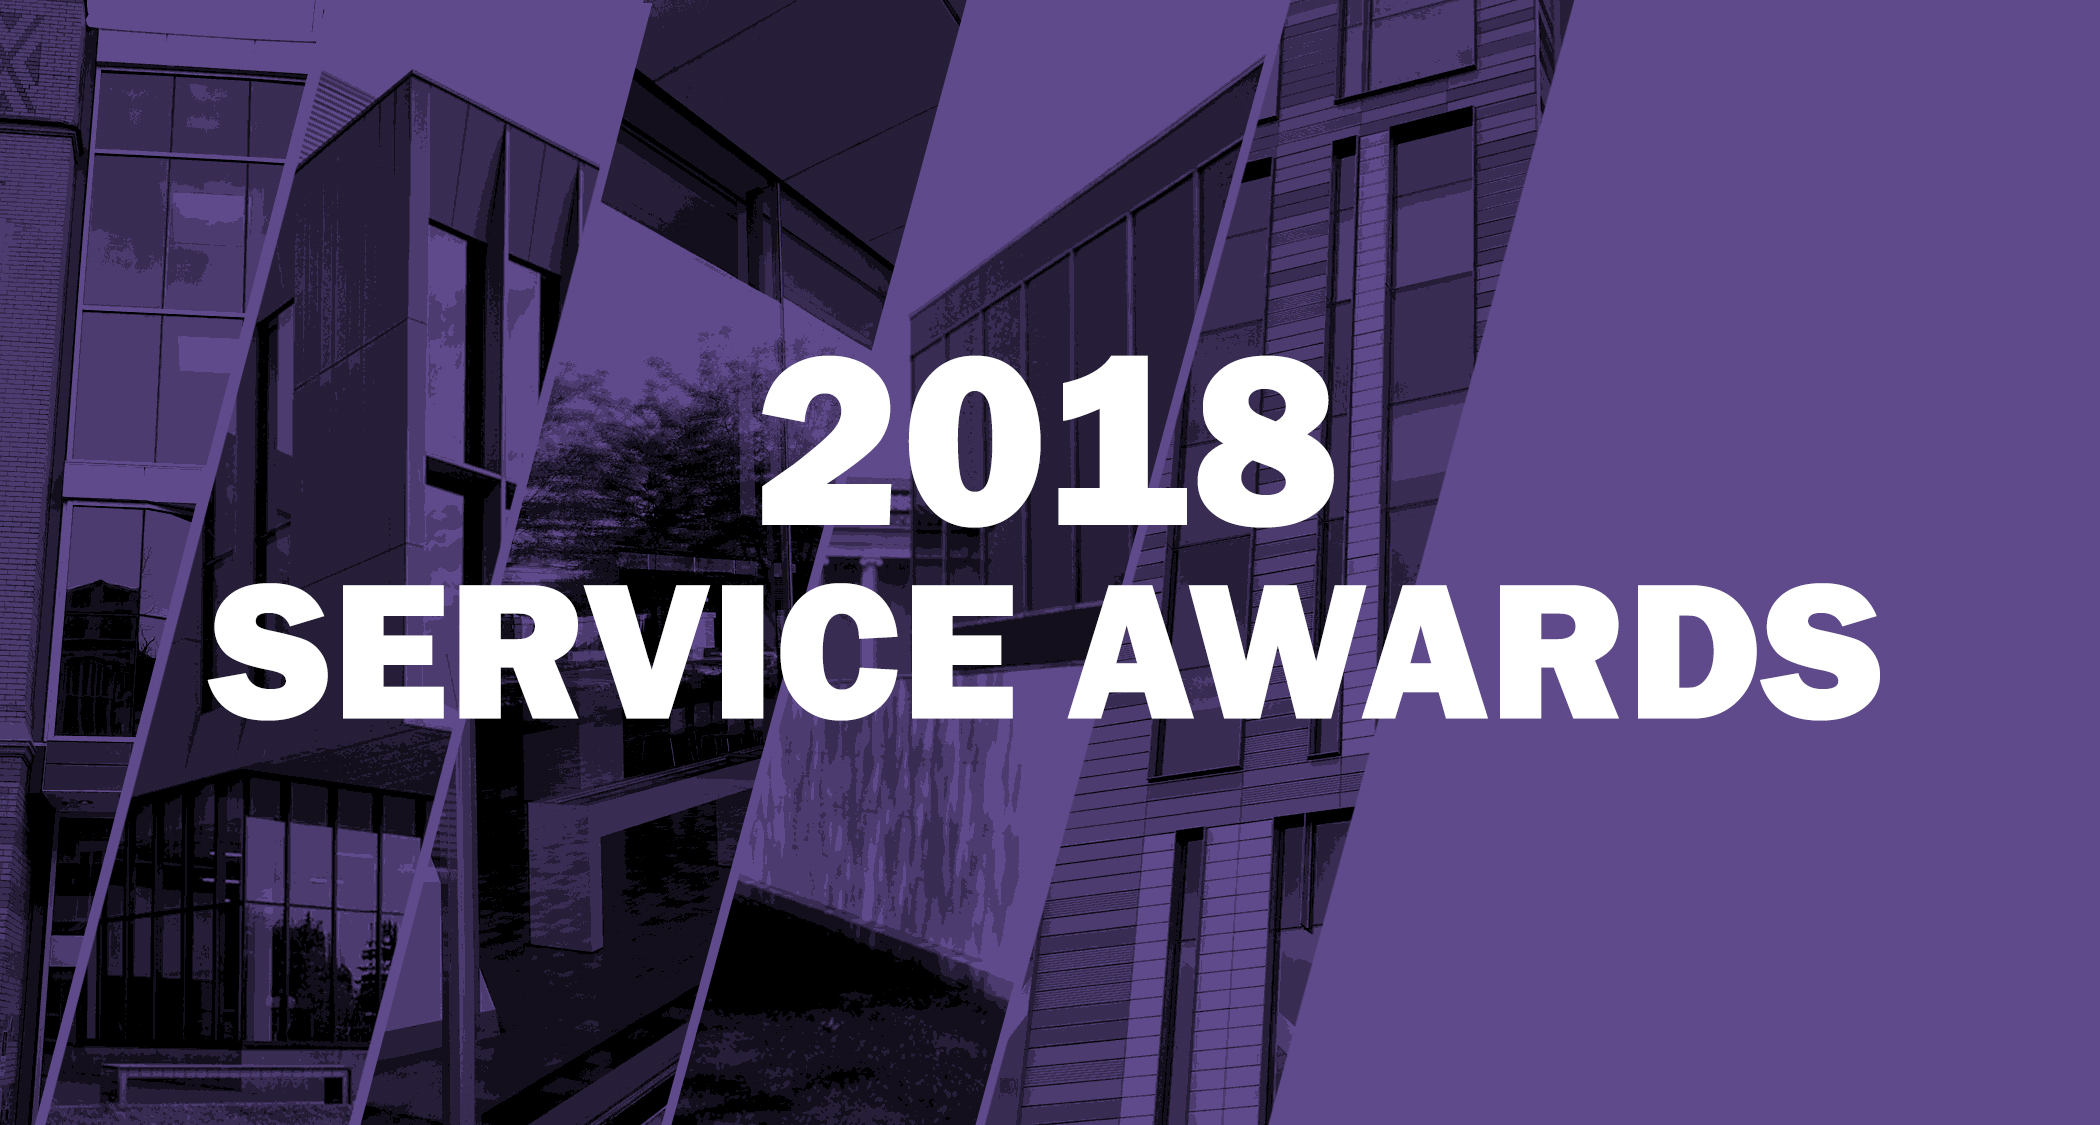 2018 Service Awards Banner.jpg